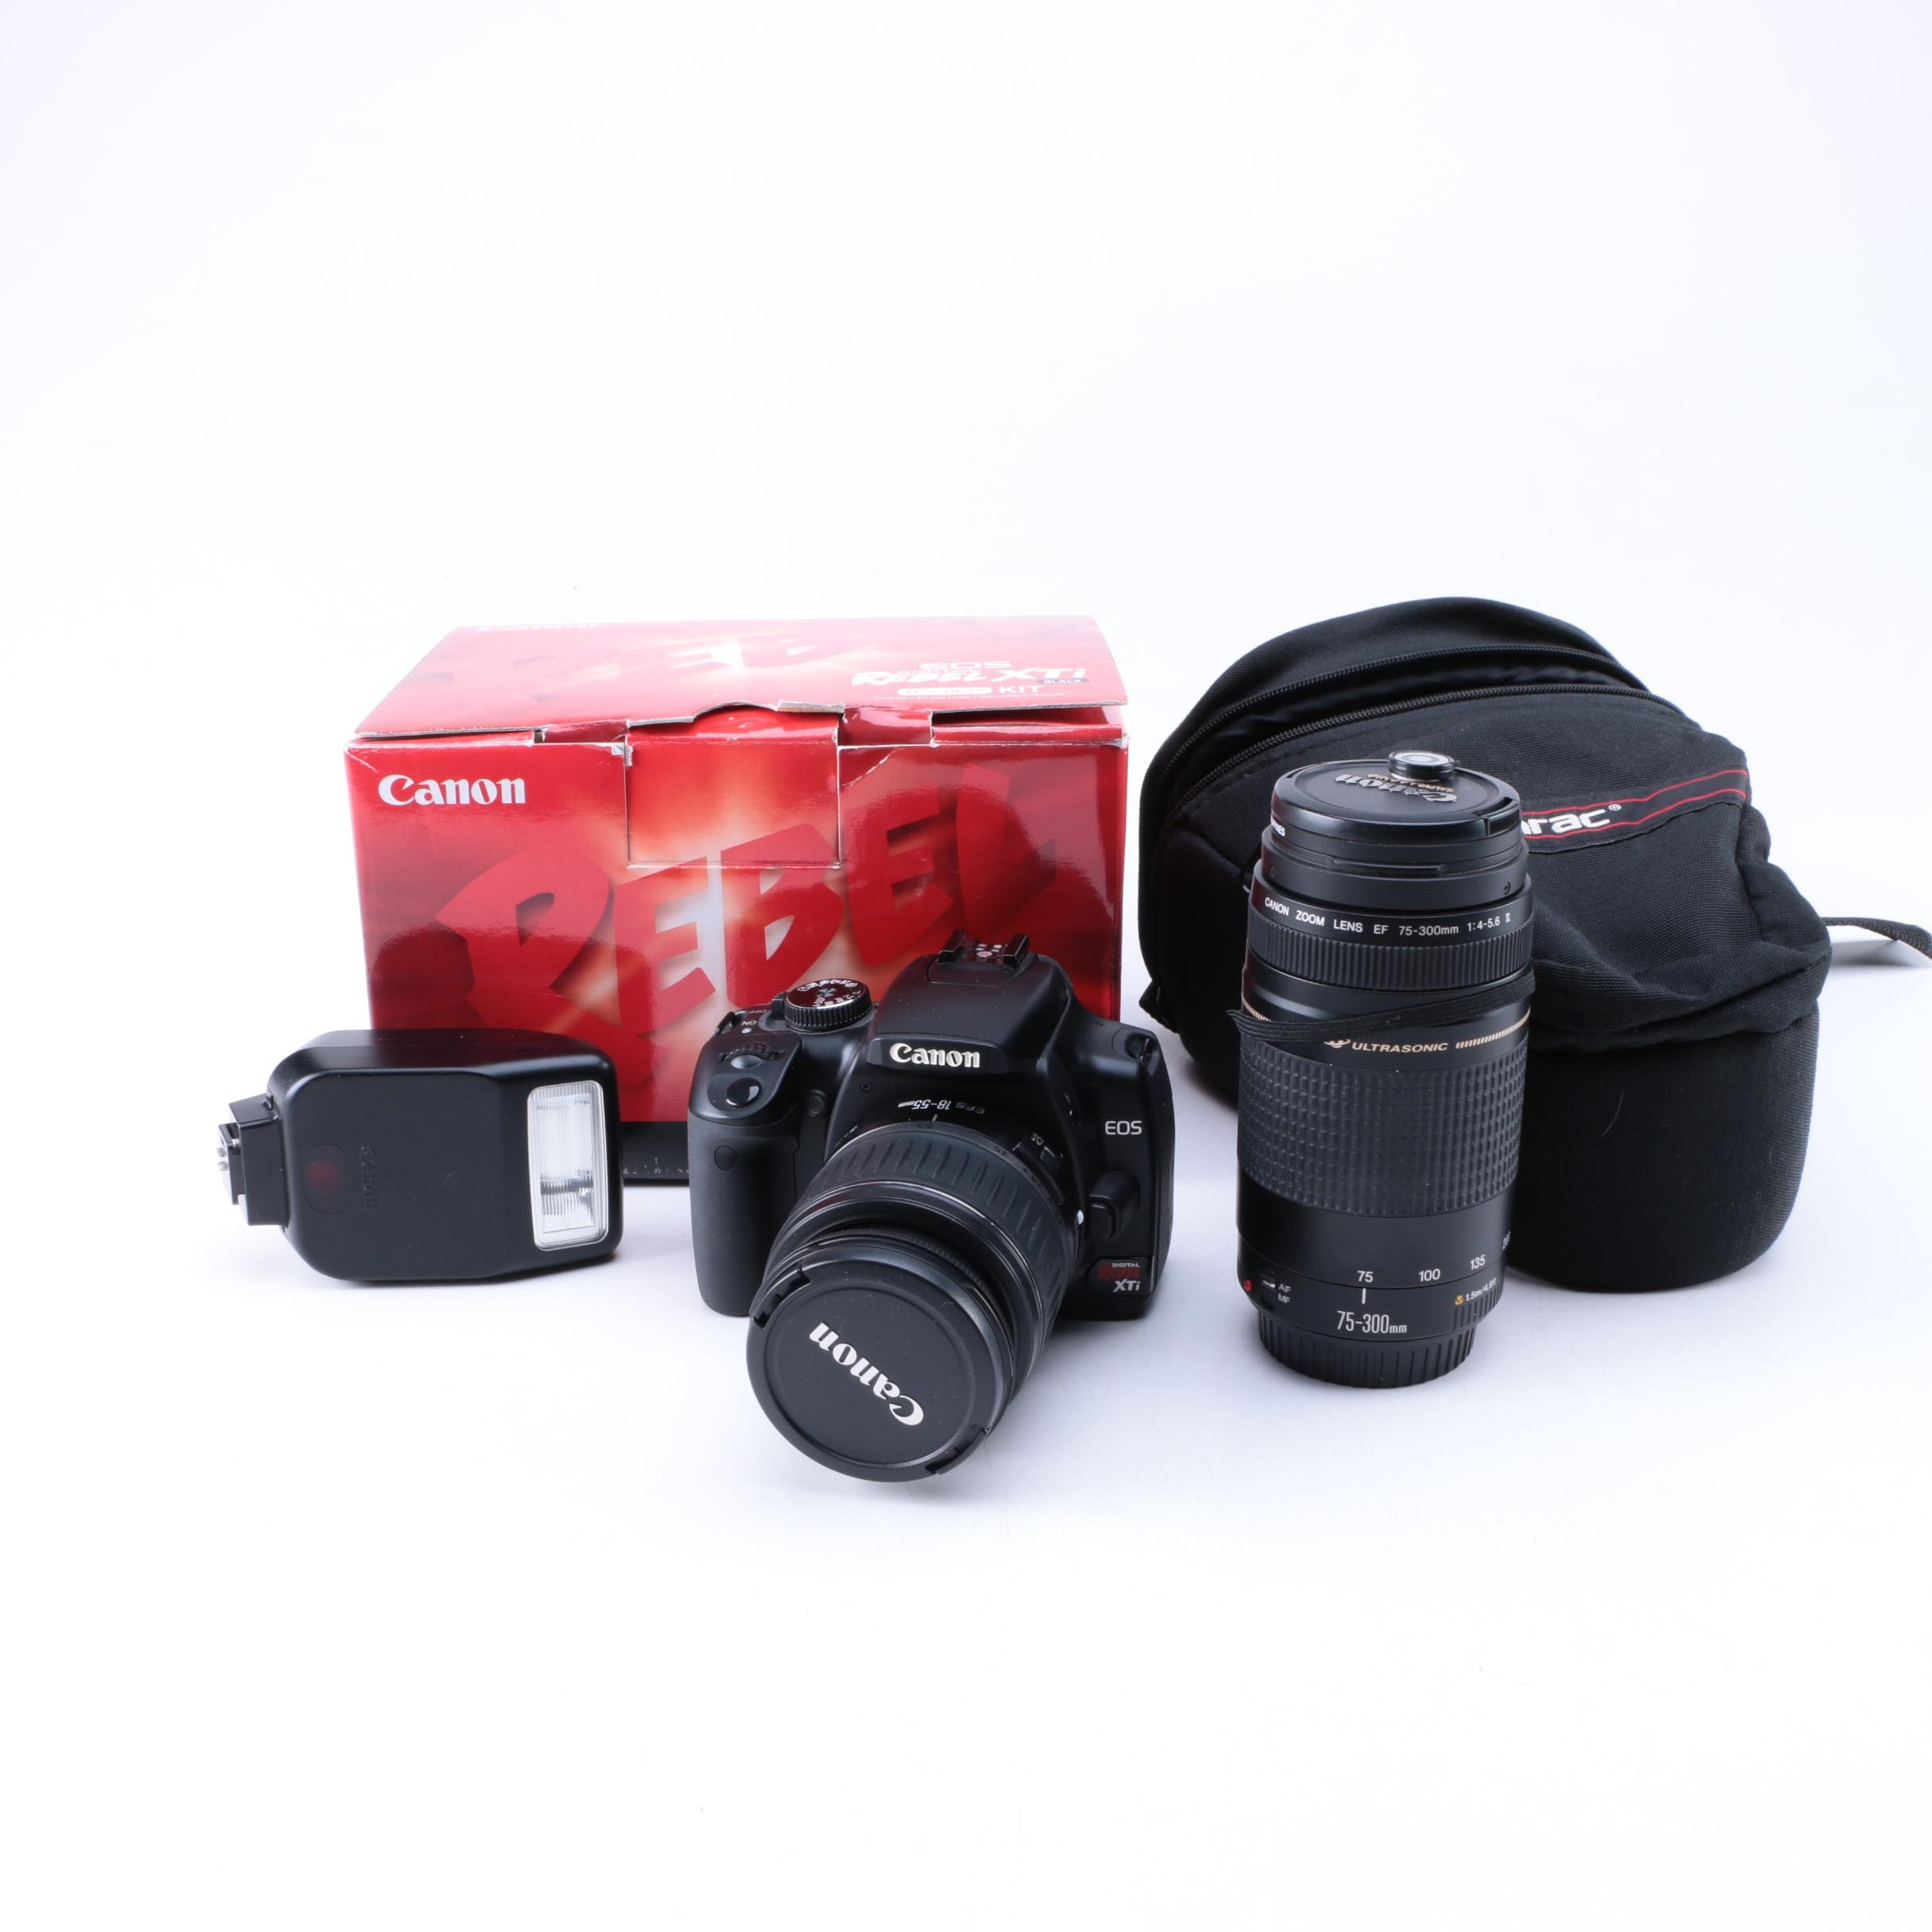 Canon EOS Digital Rebel XTi with Camera Case and Accessories